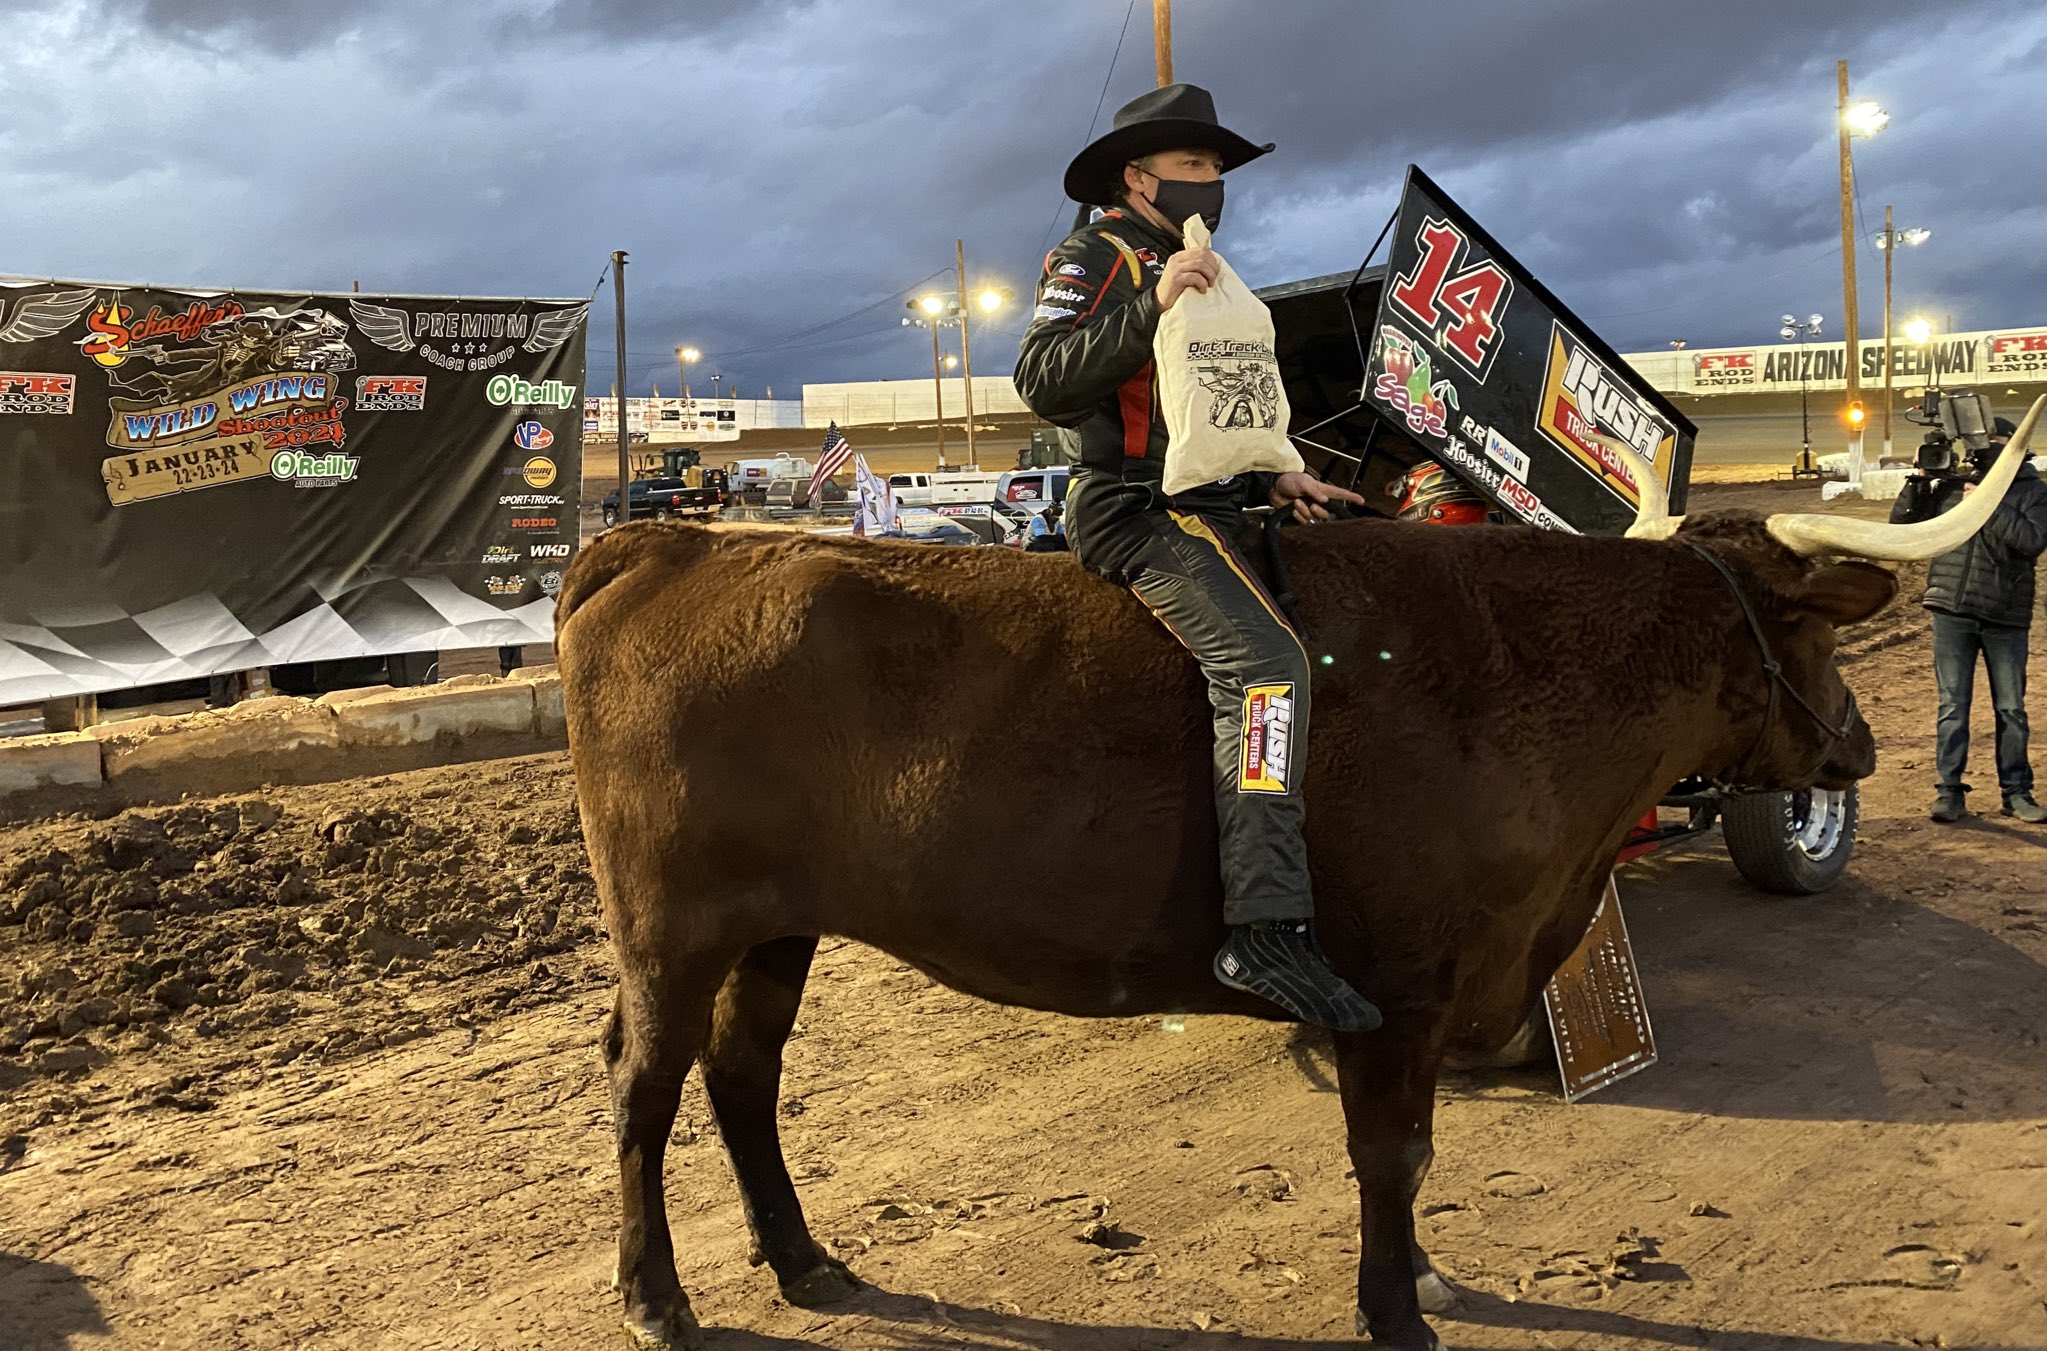 Tony Stewart on a bull at Arizona Speedway - Wild Wing Shootout